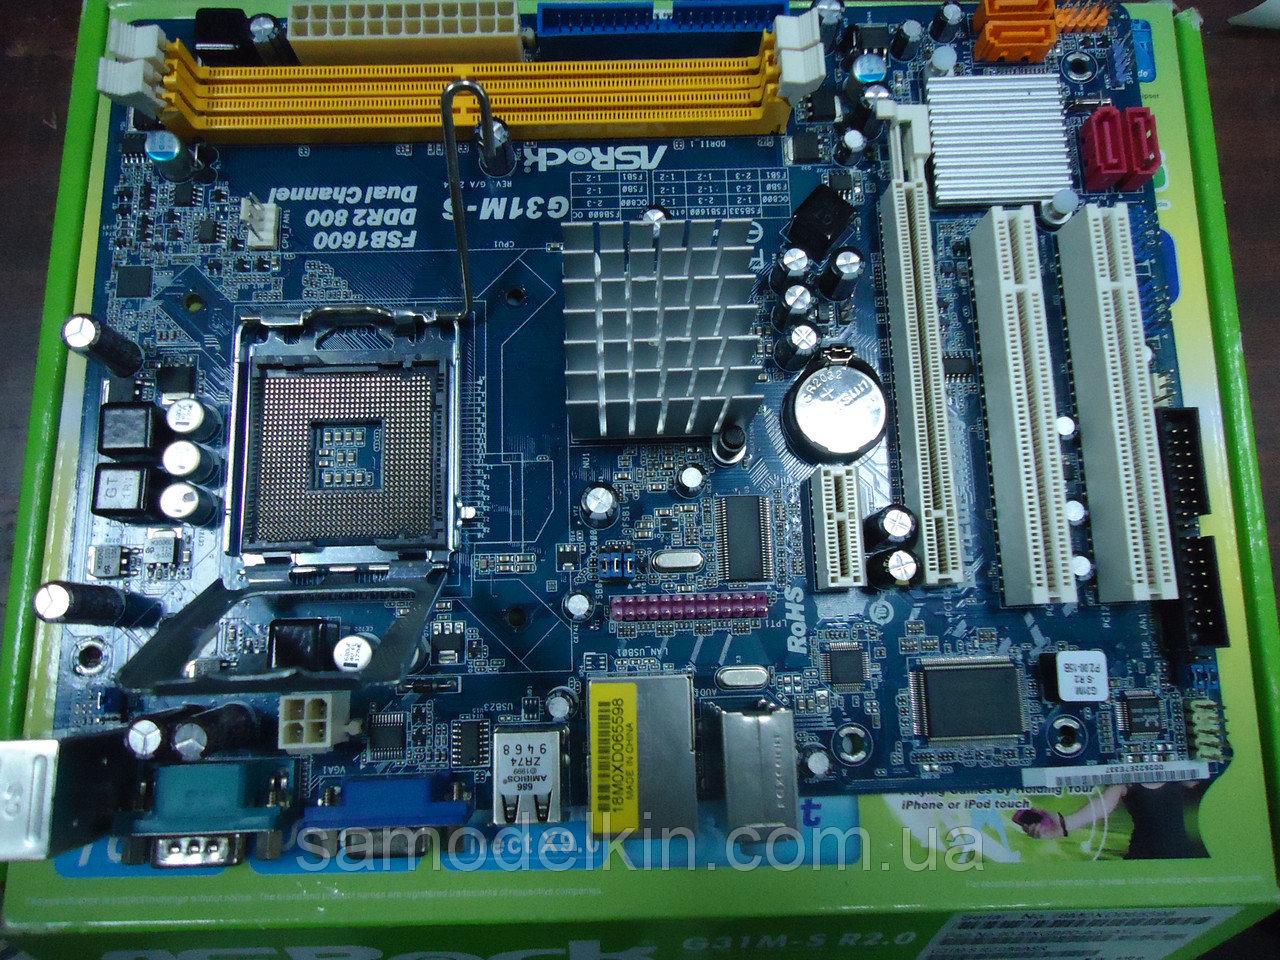 Asrock G31M-S R2.0 Intel Linux